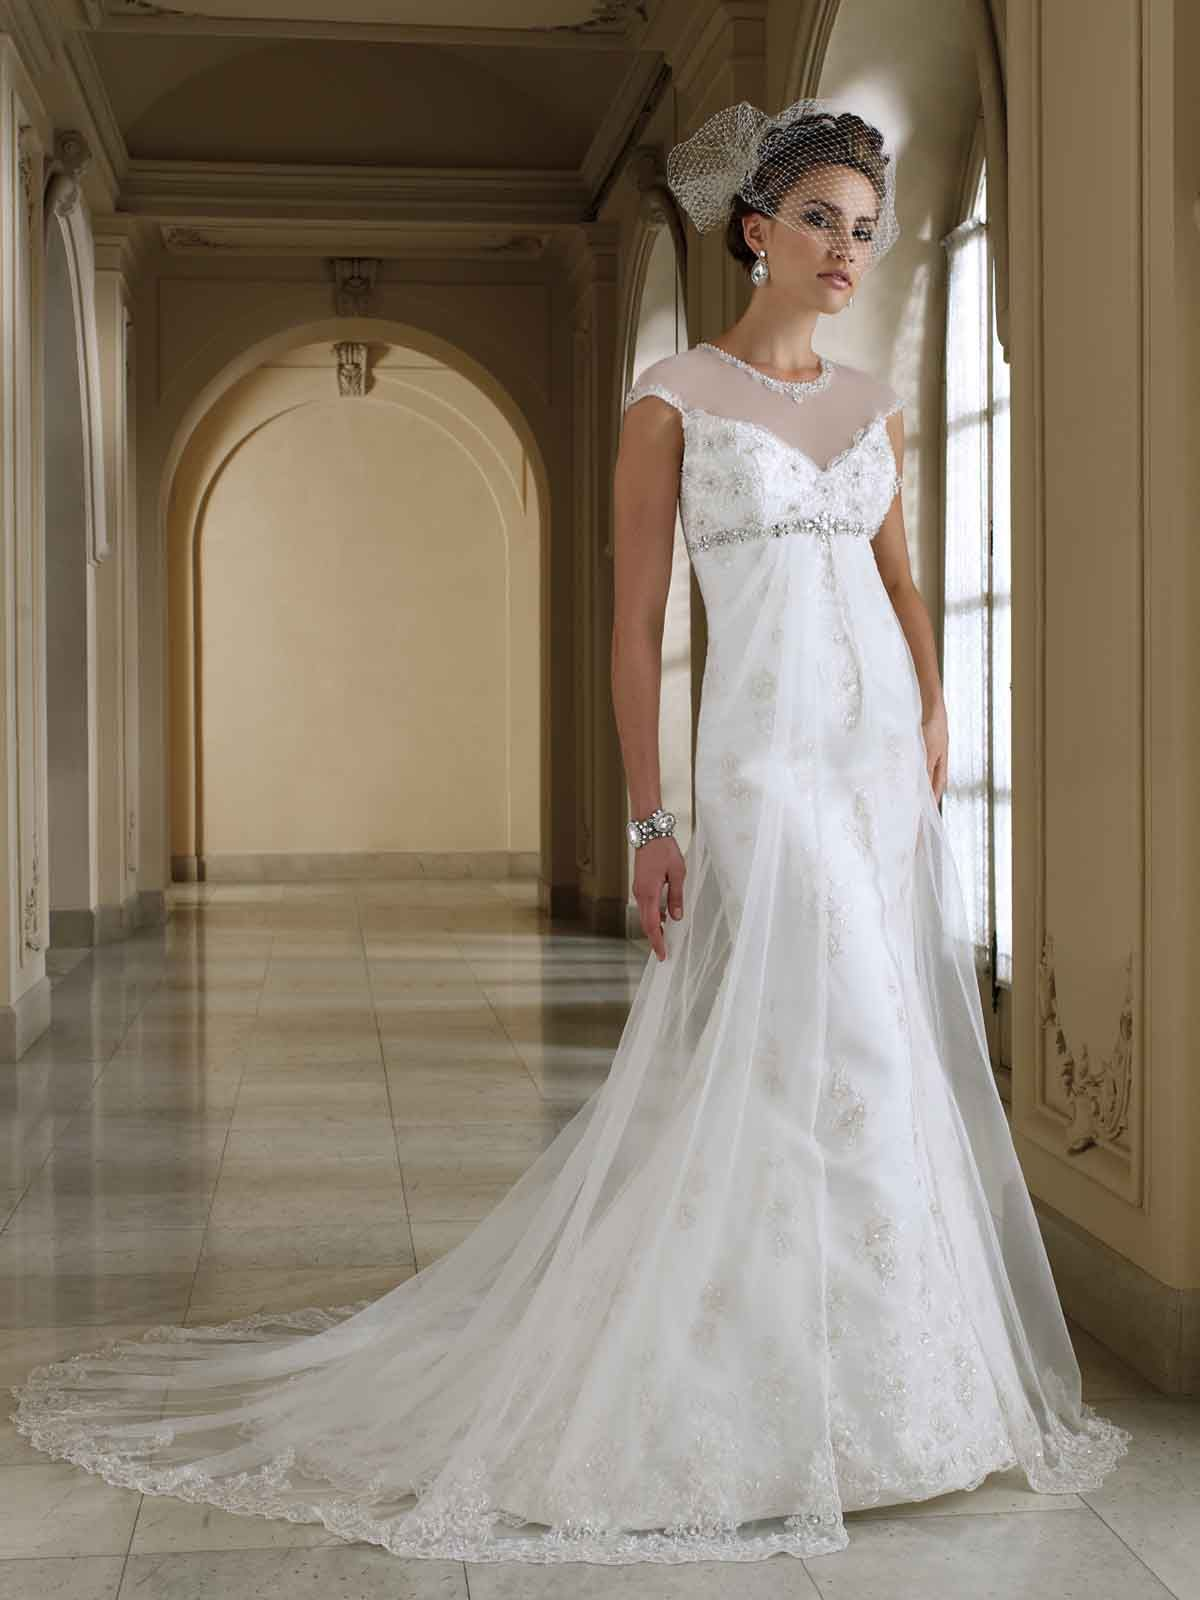 wedding-dress-endearing-petite-wedding-dresses-houston-tx-affordable ...